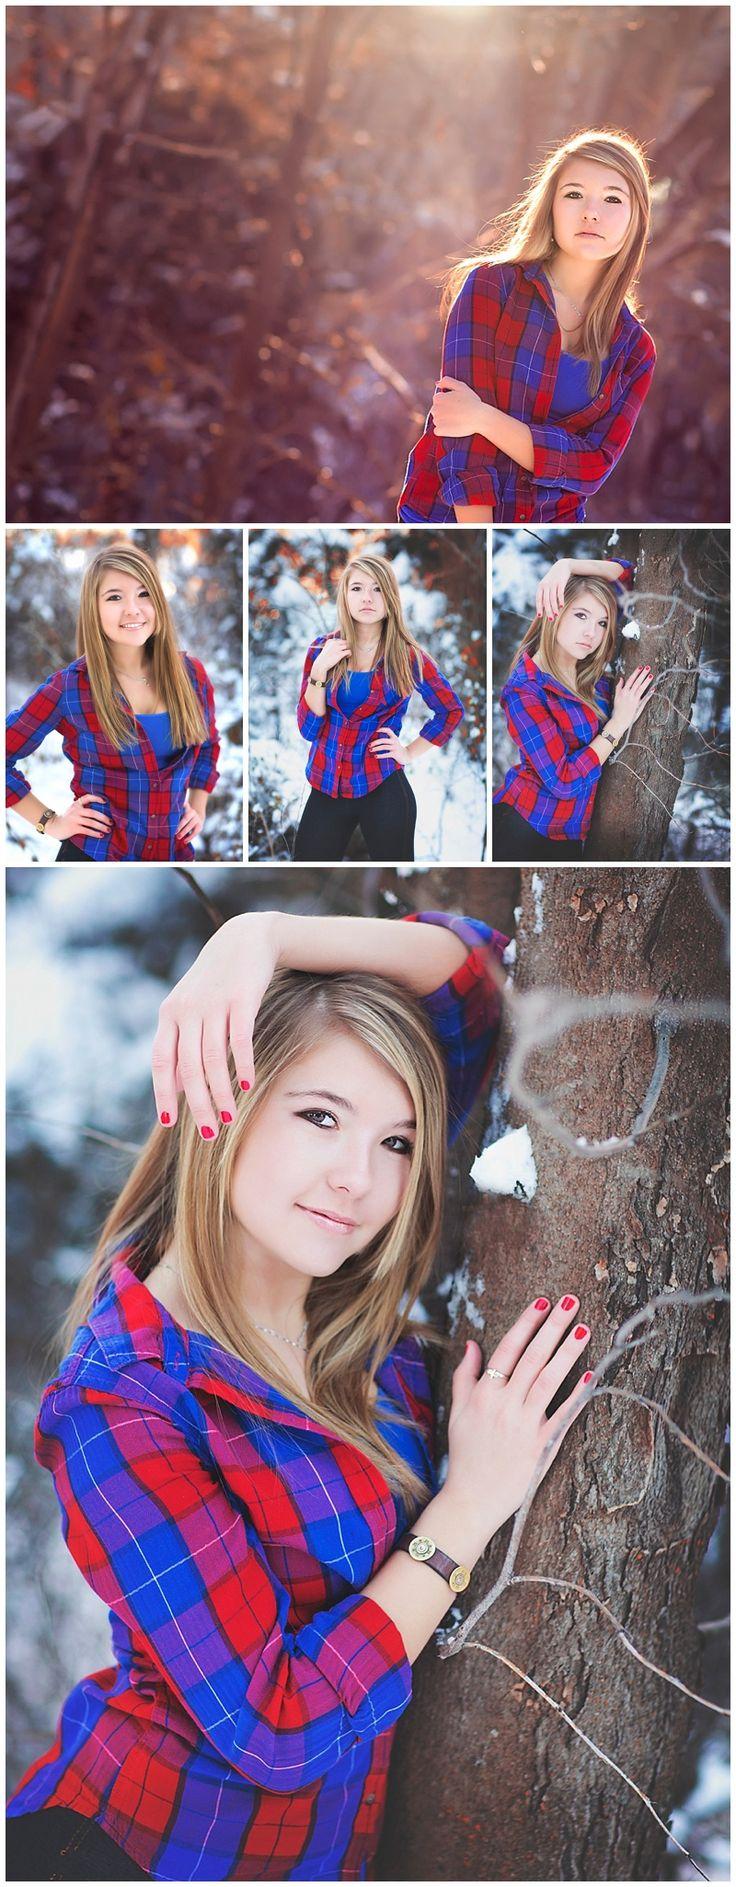 Erin Kata Photography. Senior poses in snow. Senior Girl. High School Senior. Senior Picture. Wichita Kansas Senior Photographer. Senior Photography. Senior Portraits.